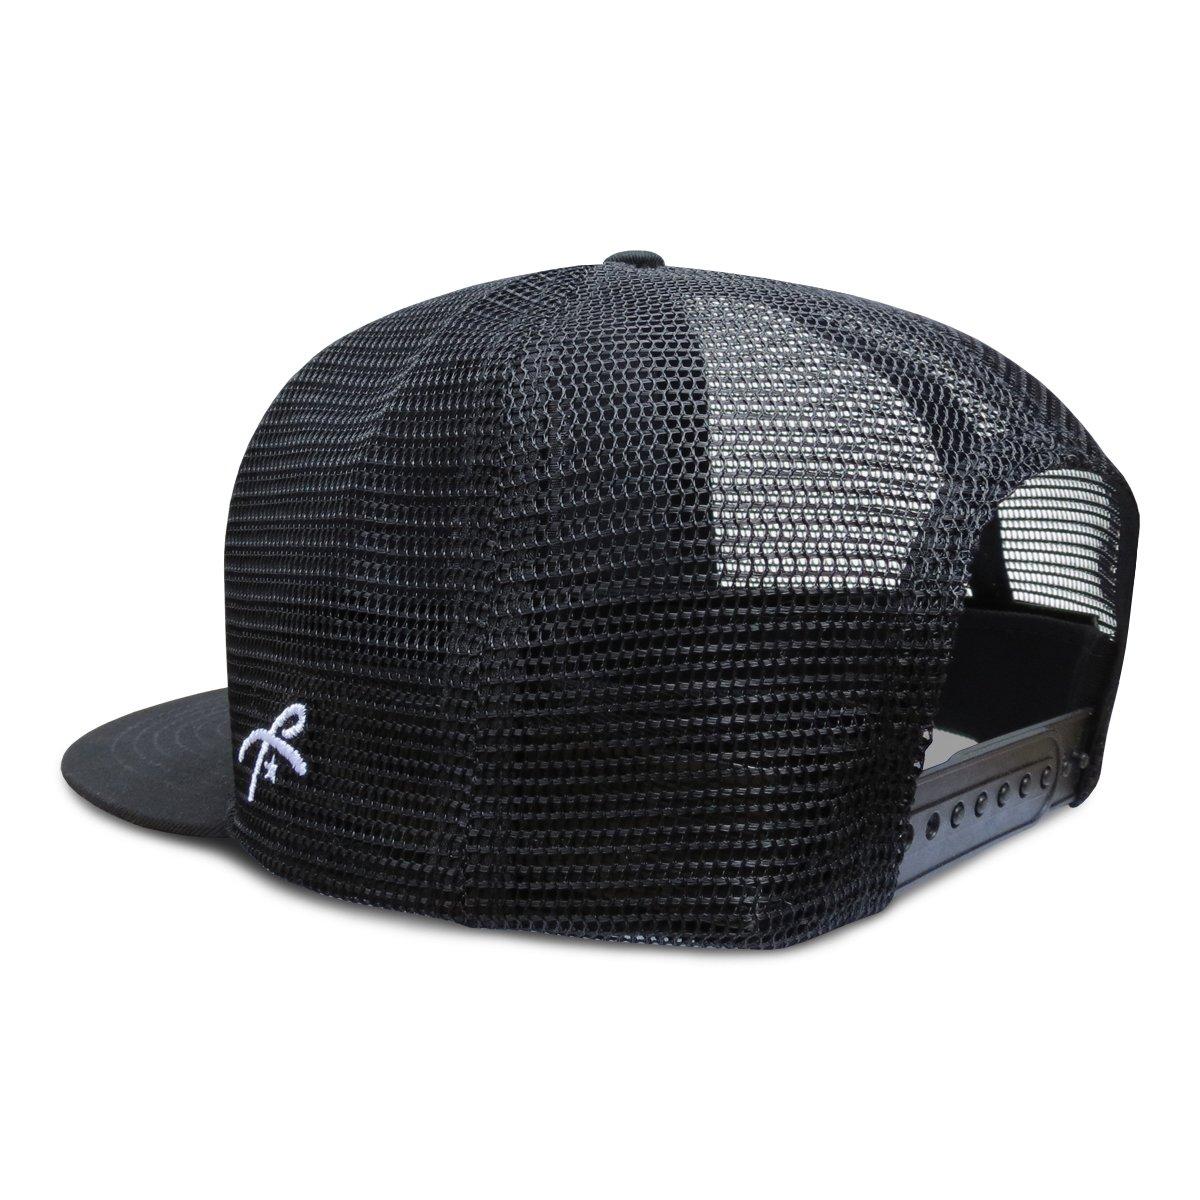 Grace Folly Trucker Hat for Men & Women. Snapback Mesh Caps Black at Amazon Mens Clothing store: